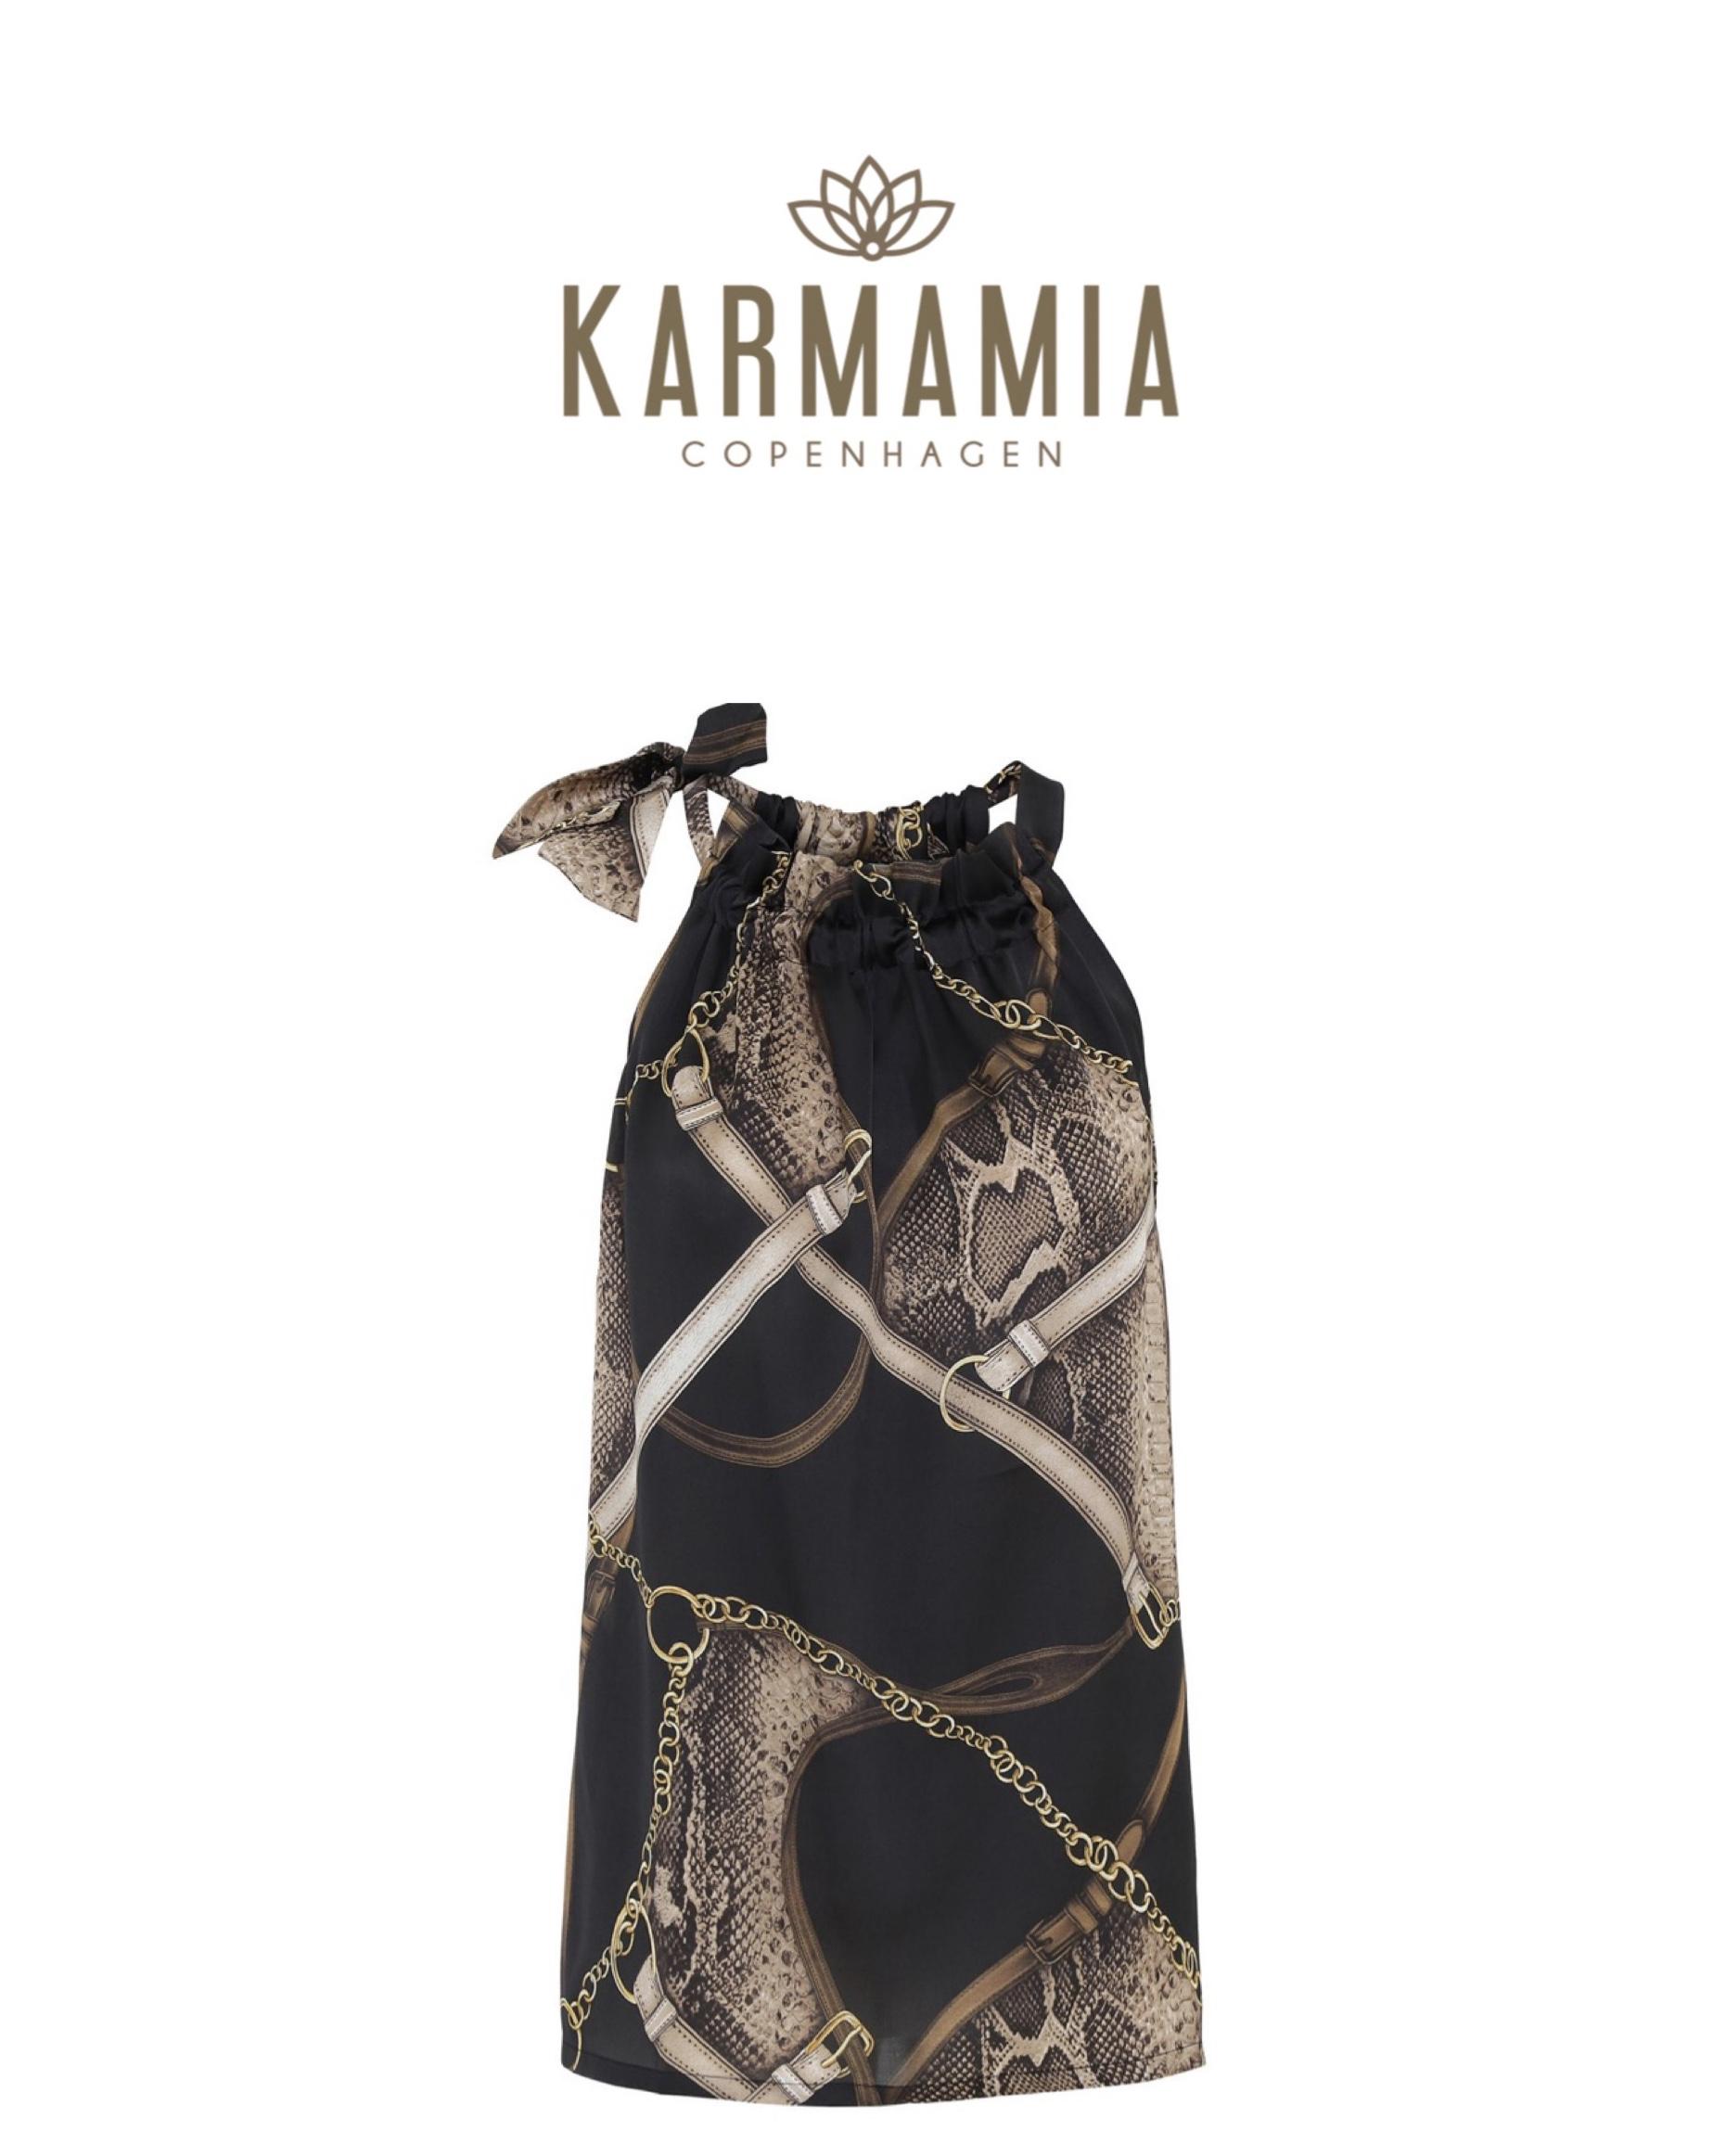 Karmamia topp IMAGE BY ME